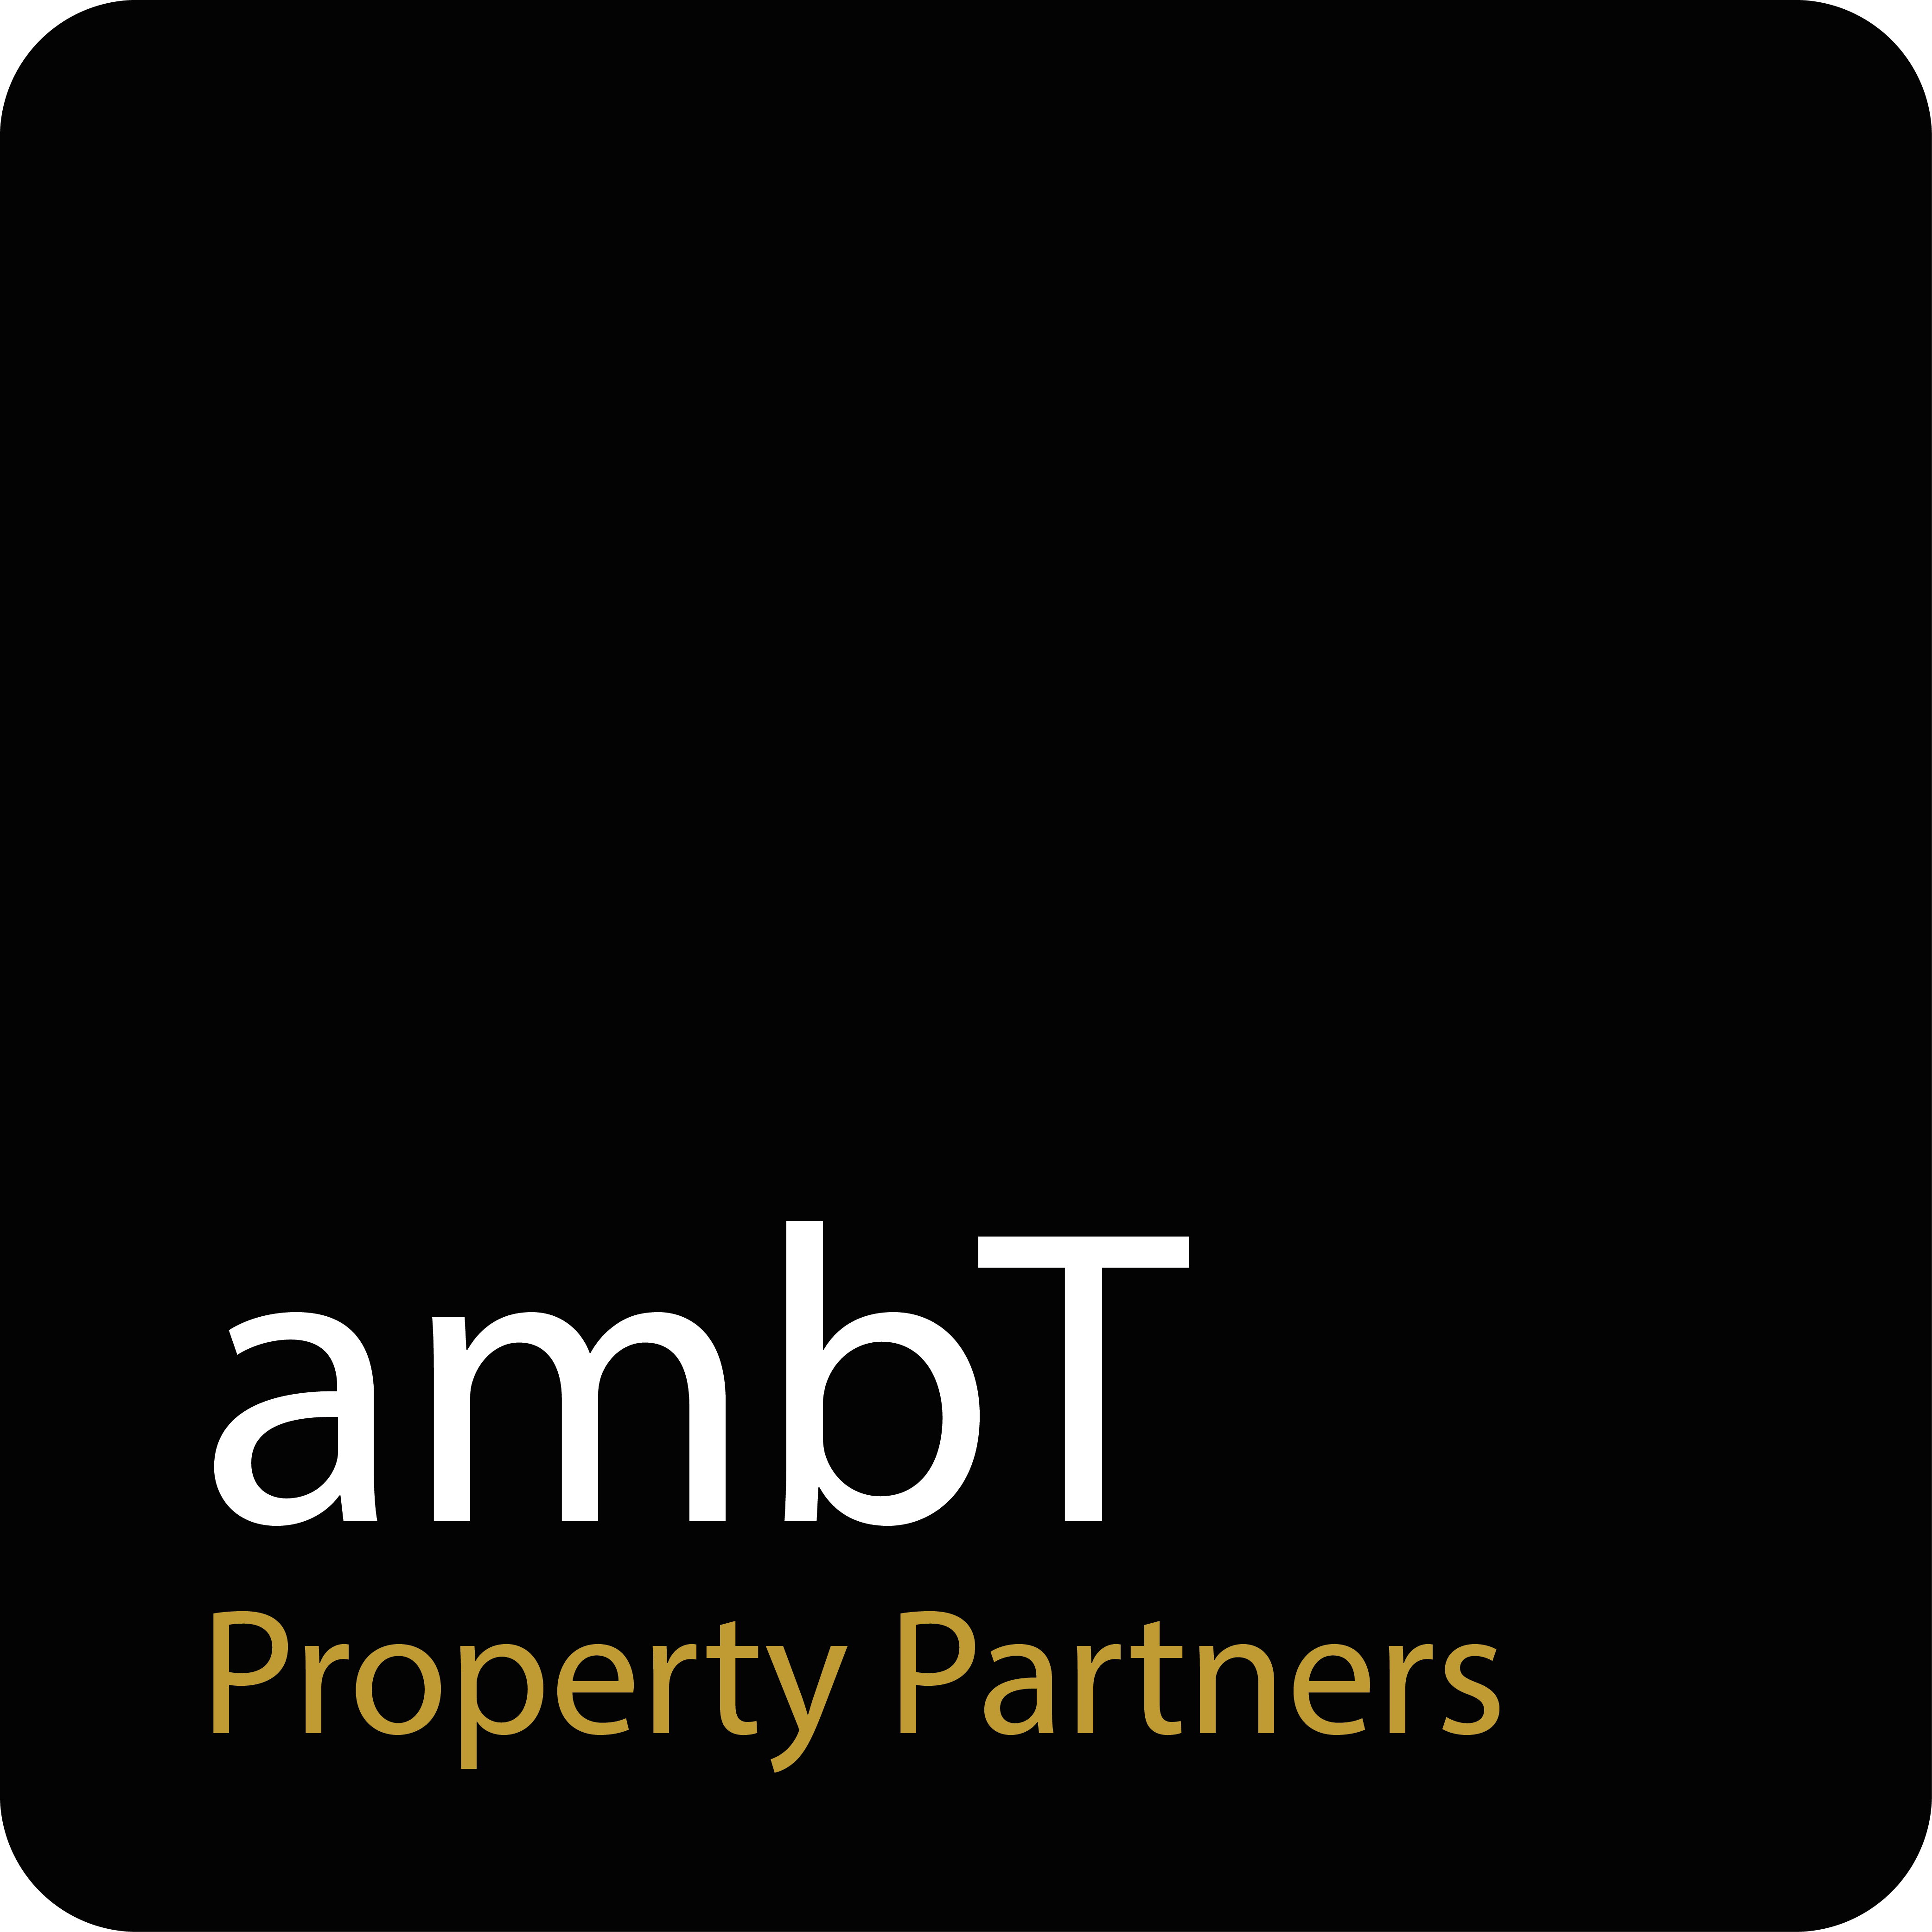 ambT Property Partners Logo